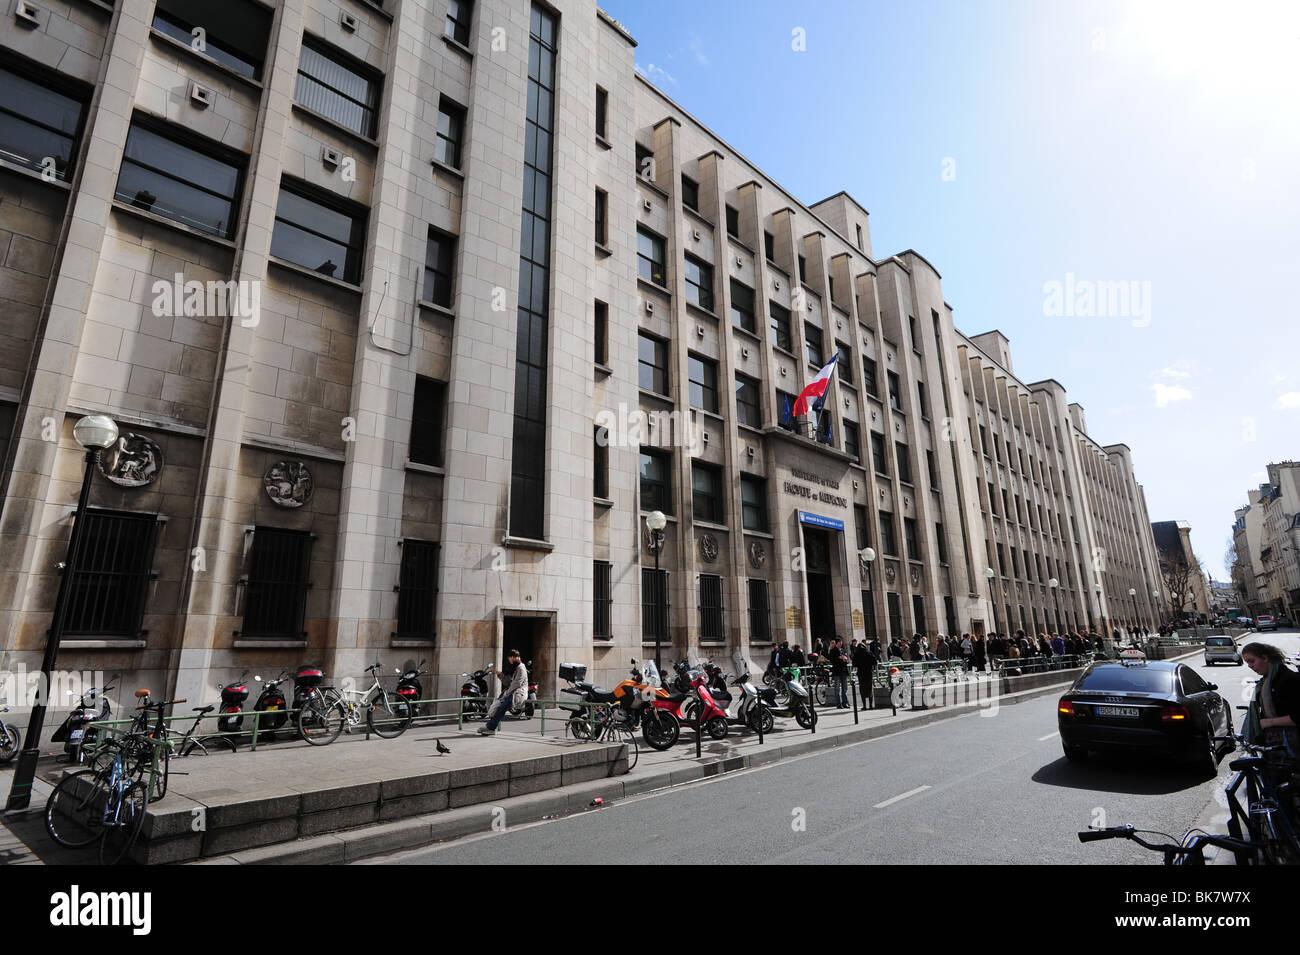 France Paris University of Paris Medical School - Stock Image